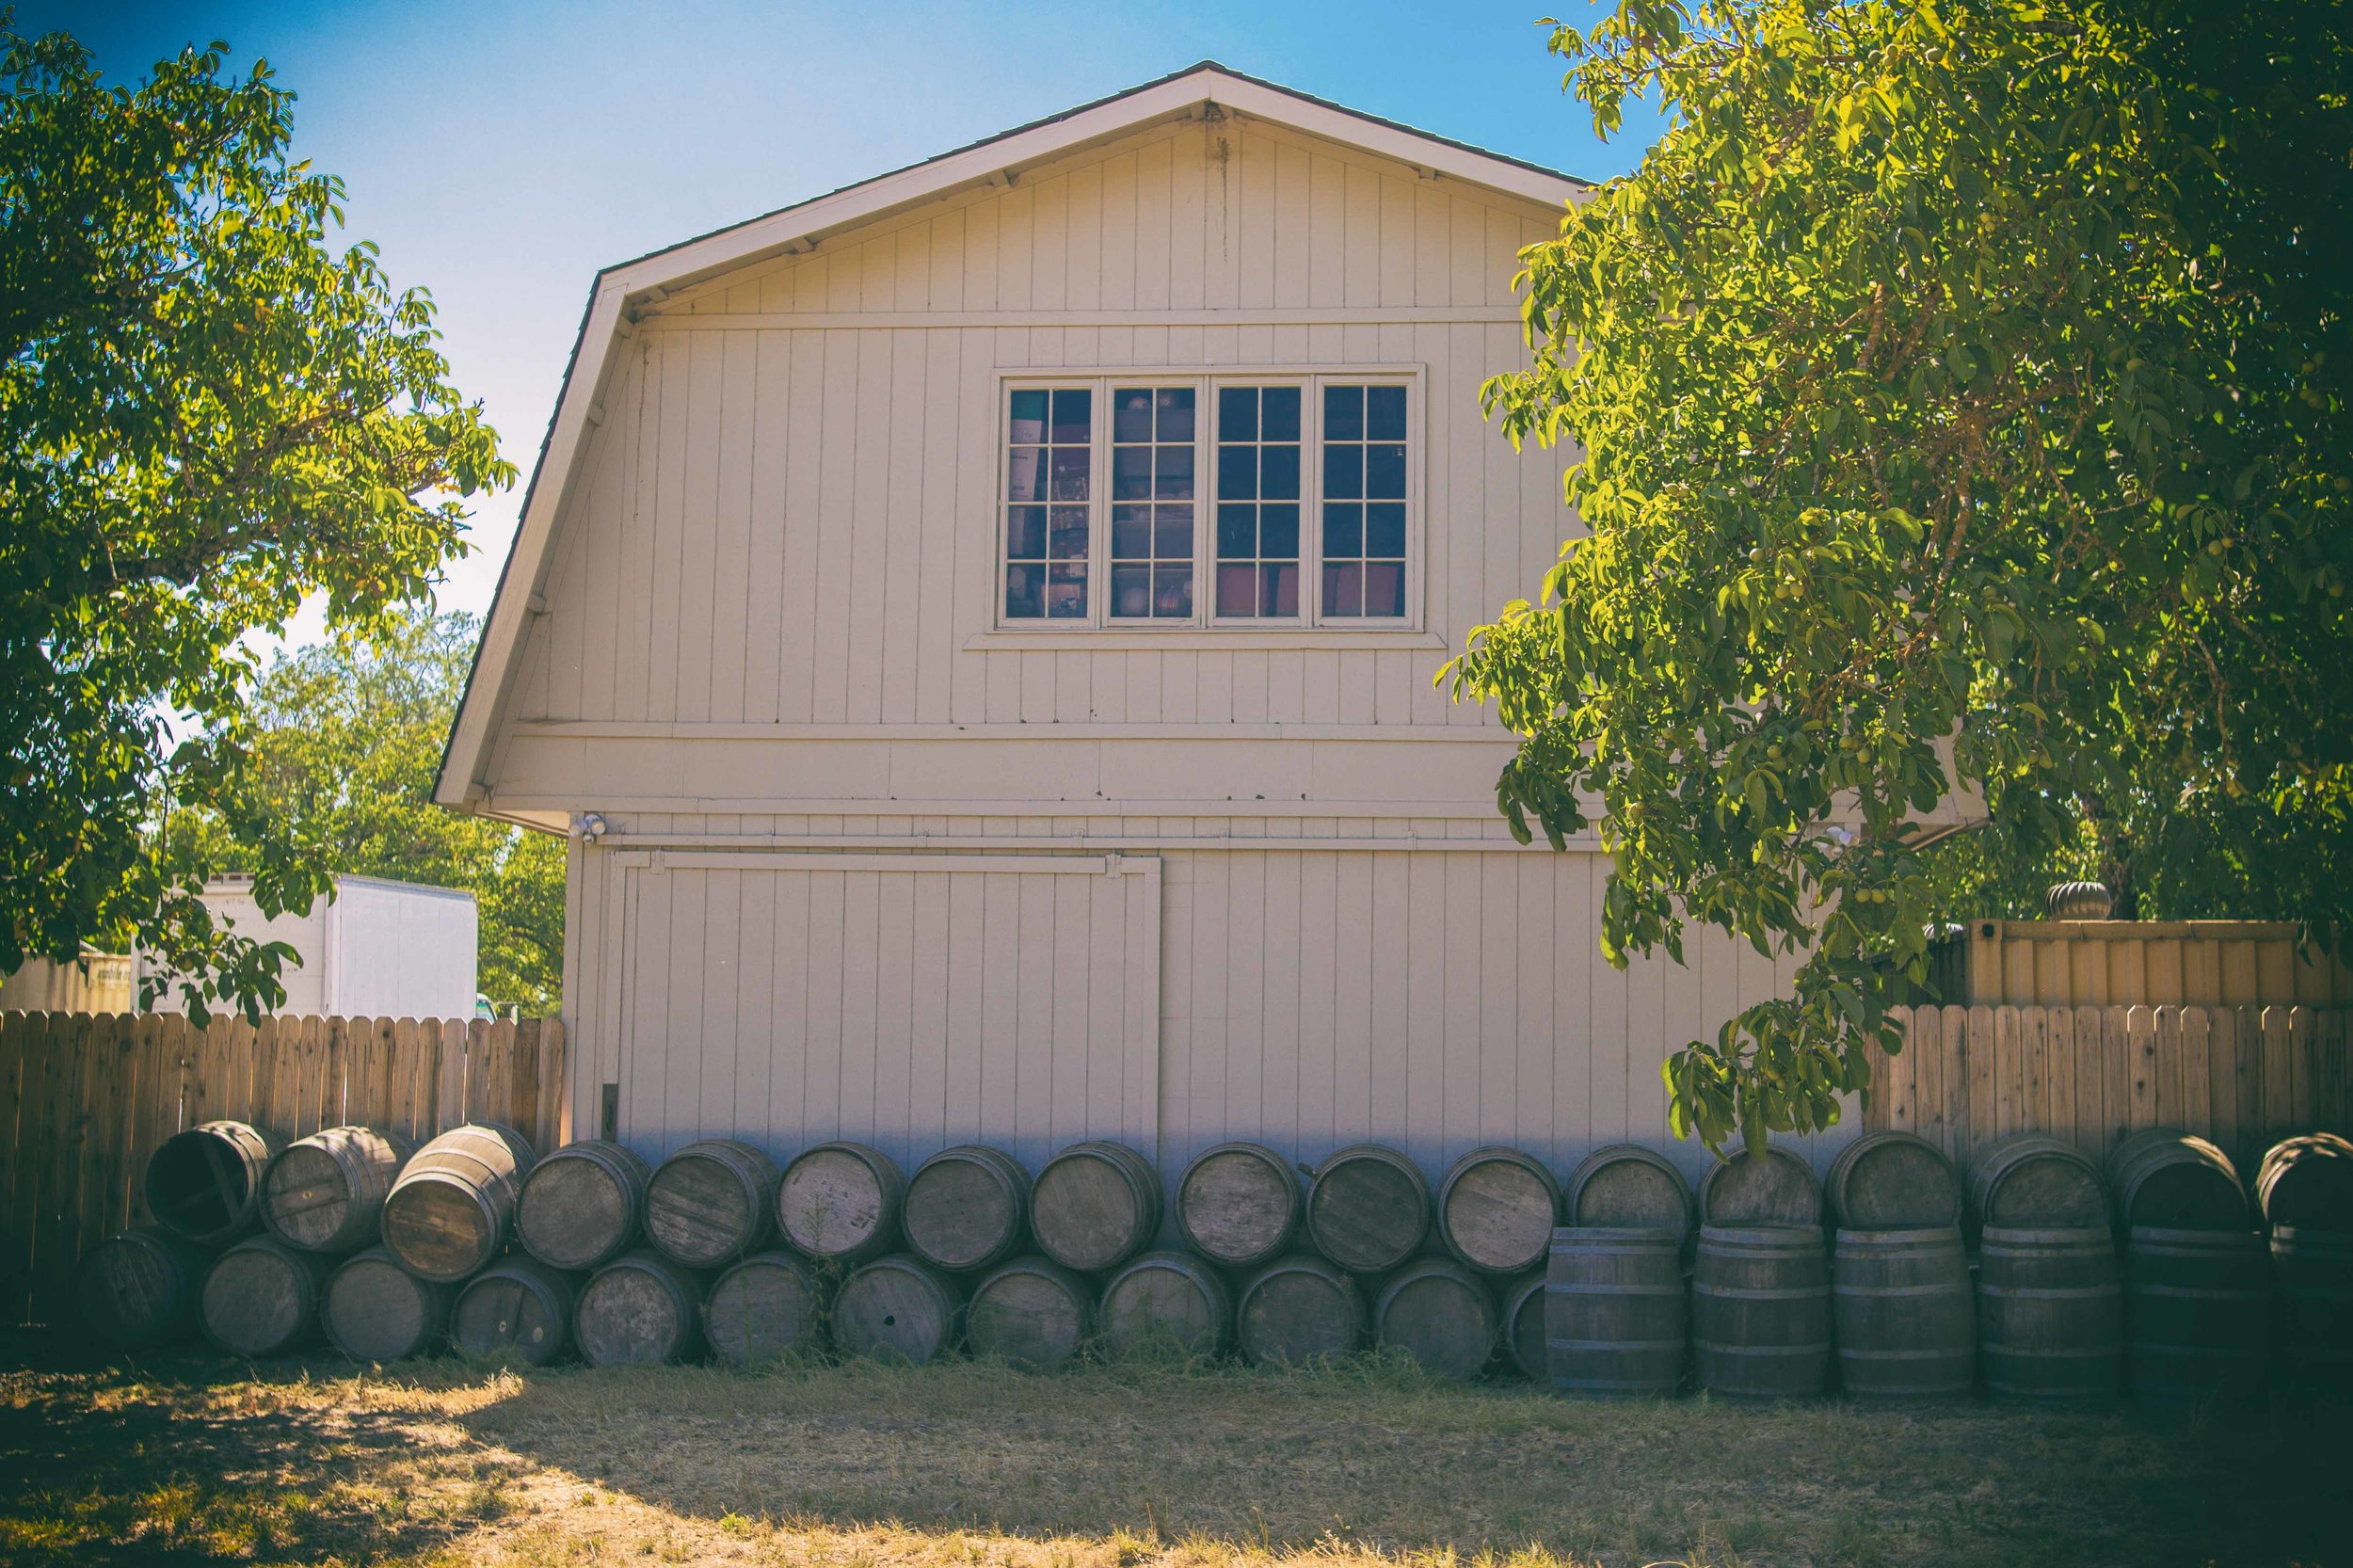 This beautiful barn